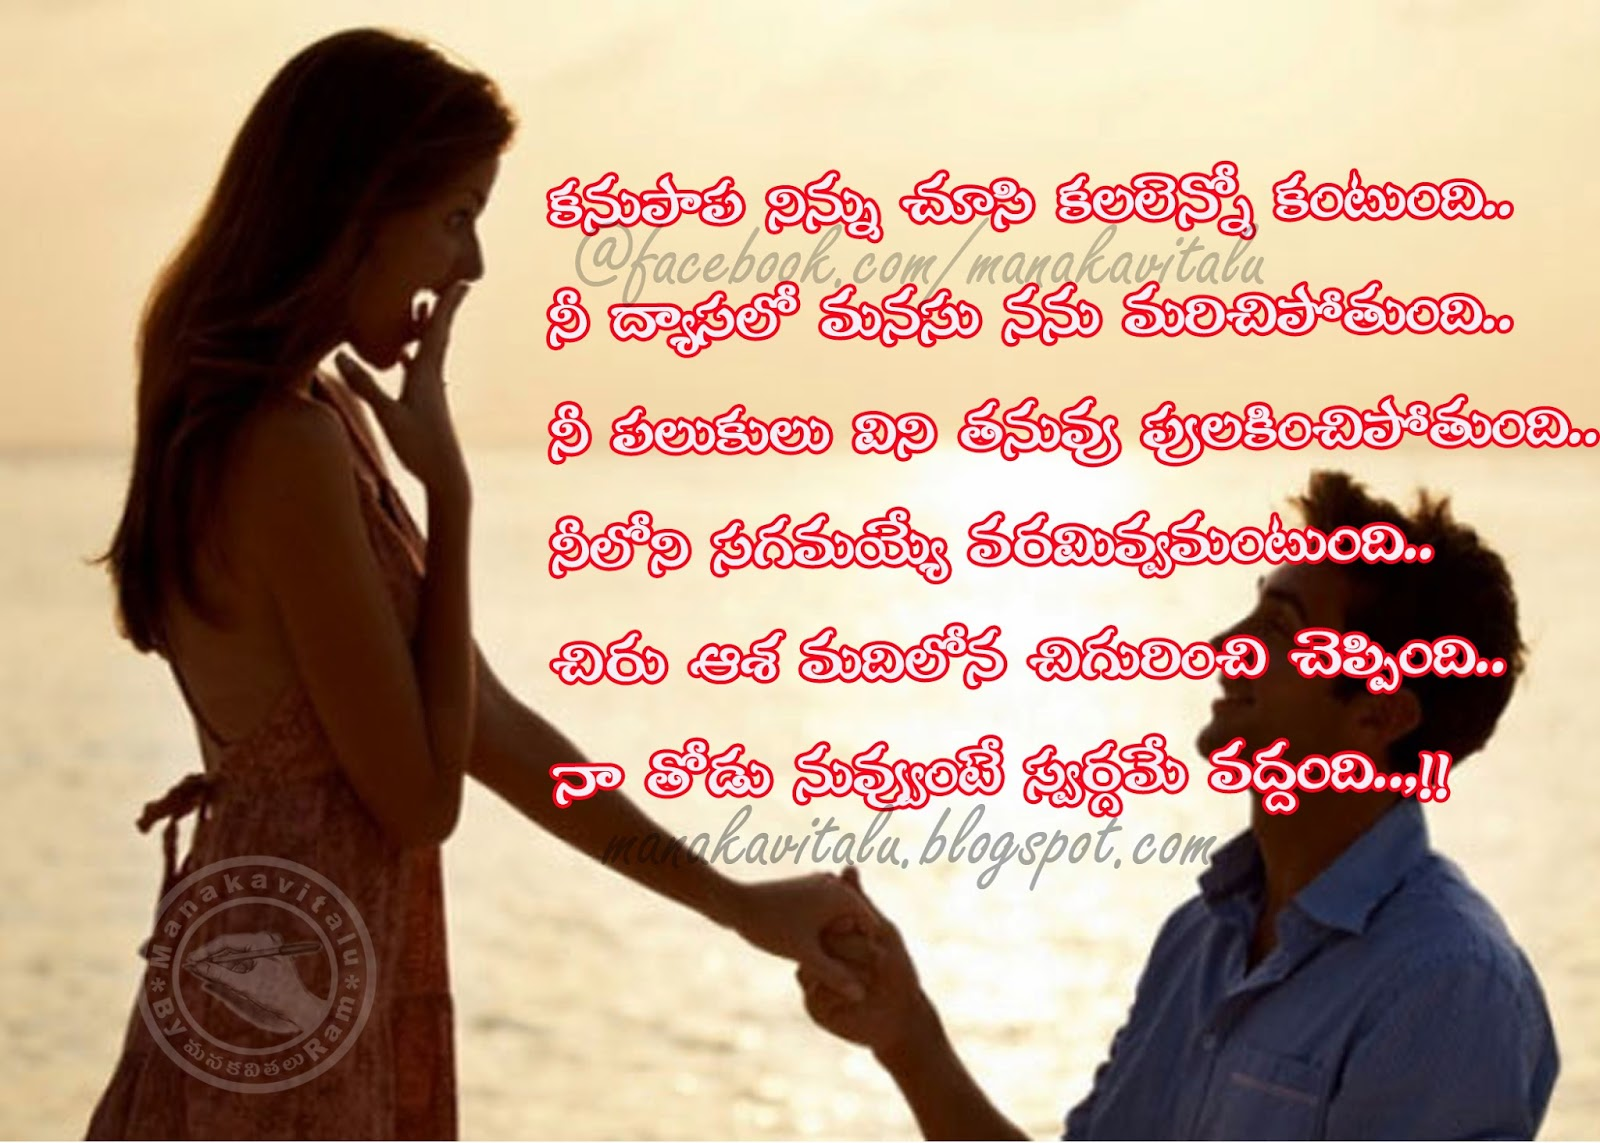 new Telugu love kavitha in English images by manakavitalu